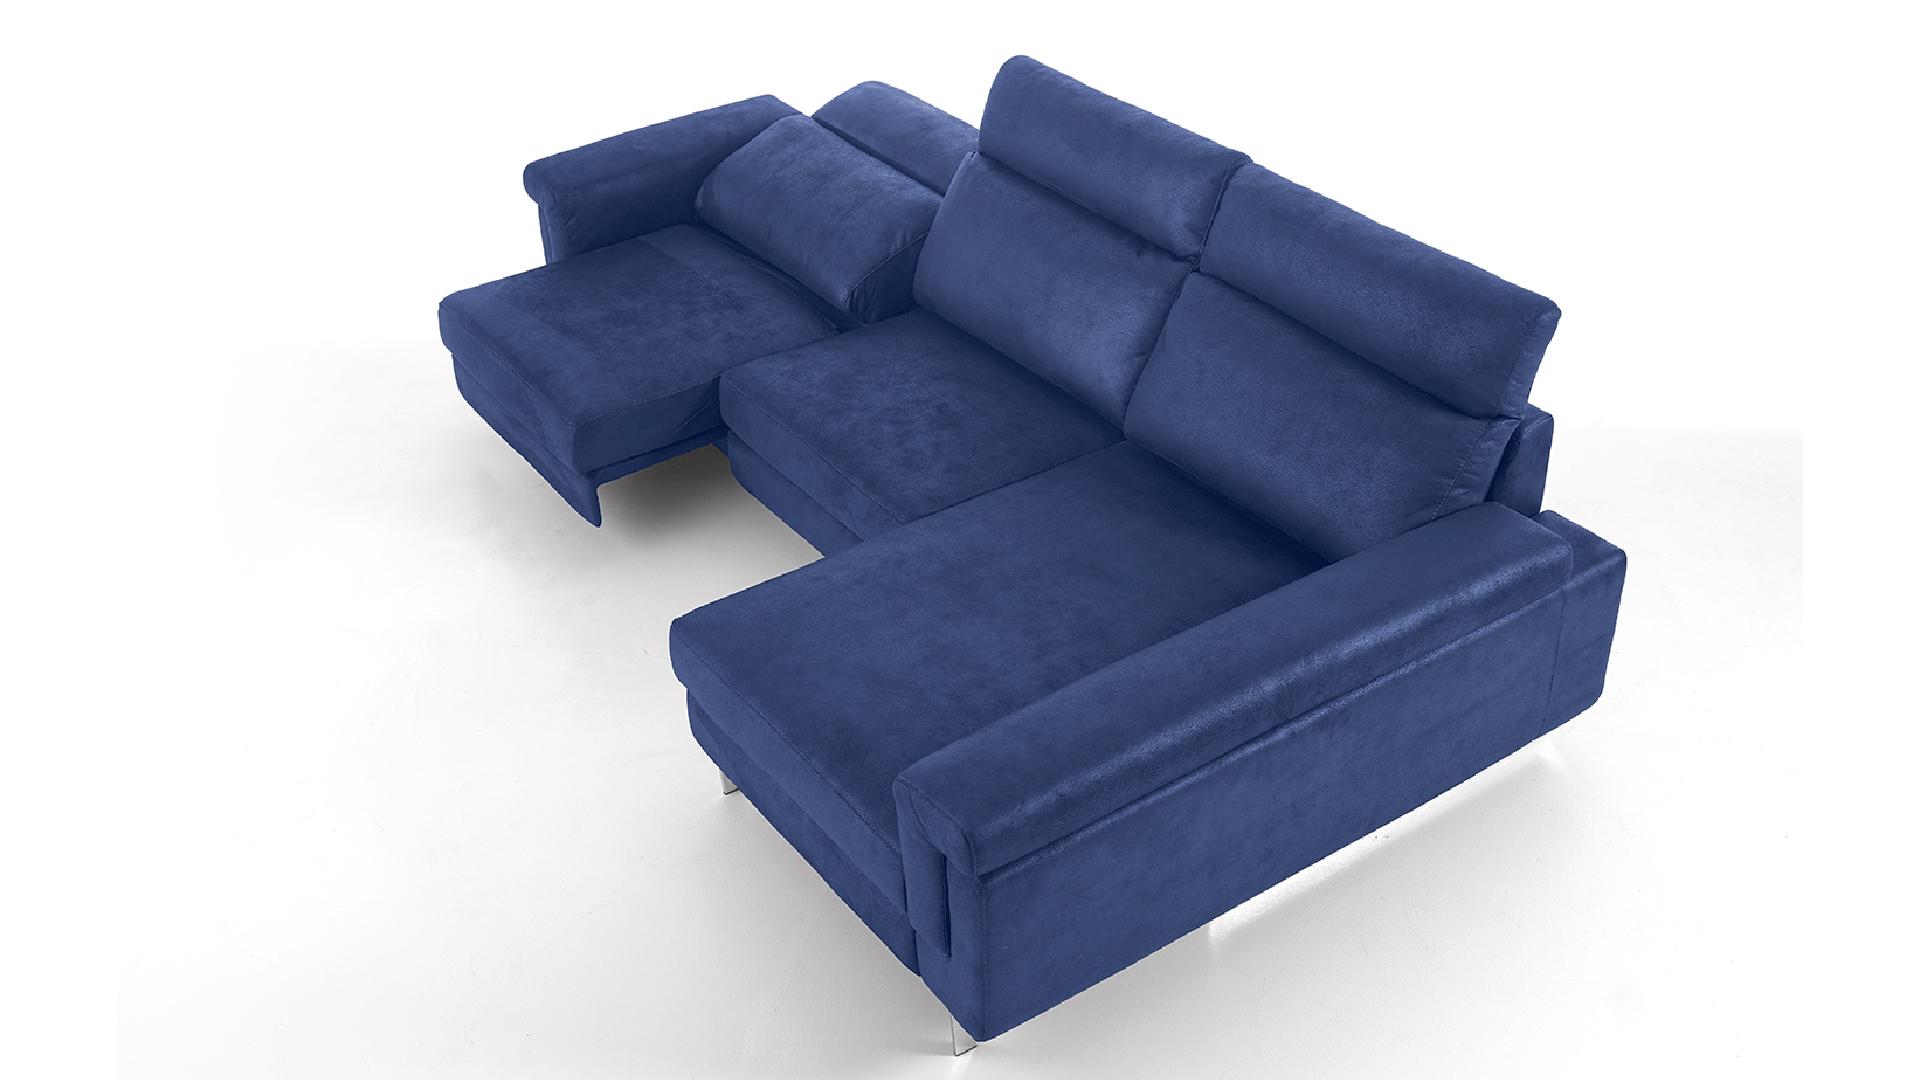 le blog mobiliermoss canape relax tissu bleu 2 places meridienne canelo mobiliermoss. Black Bedroom Furniture Sets. Home Design Ideas